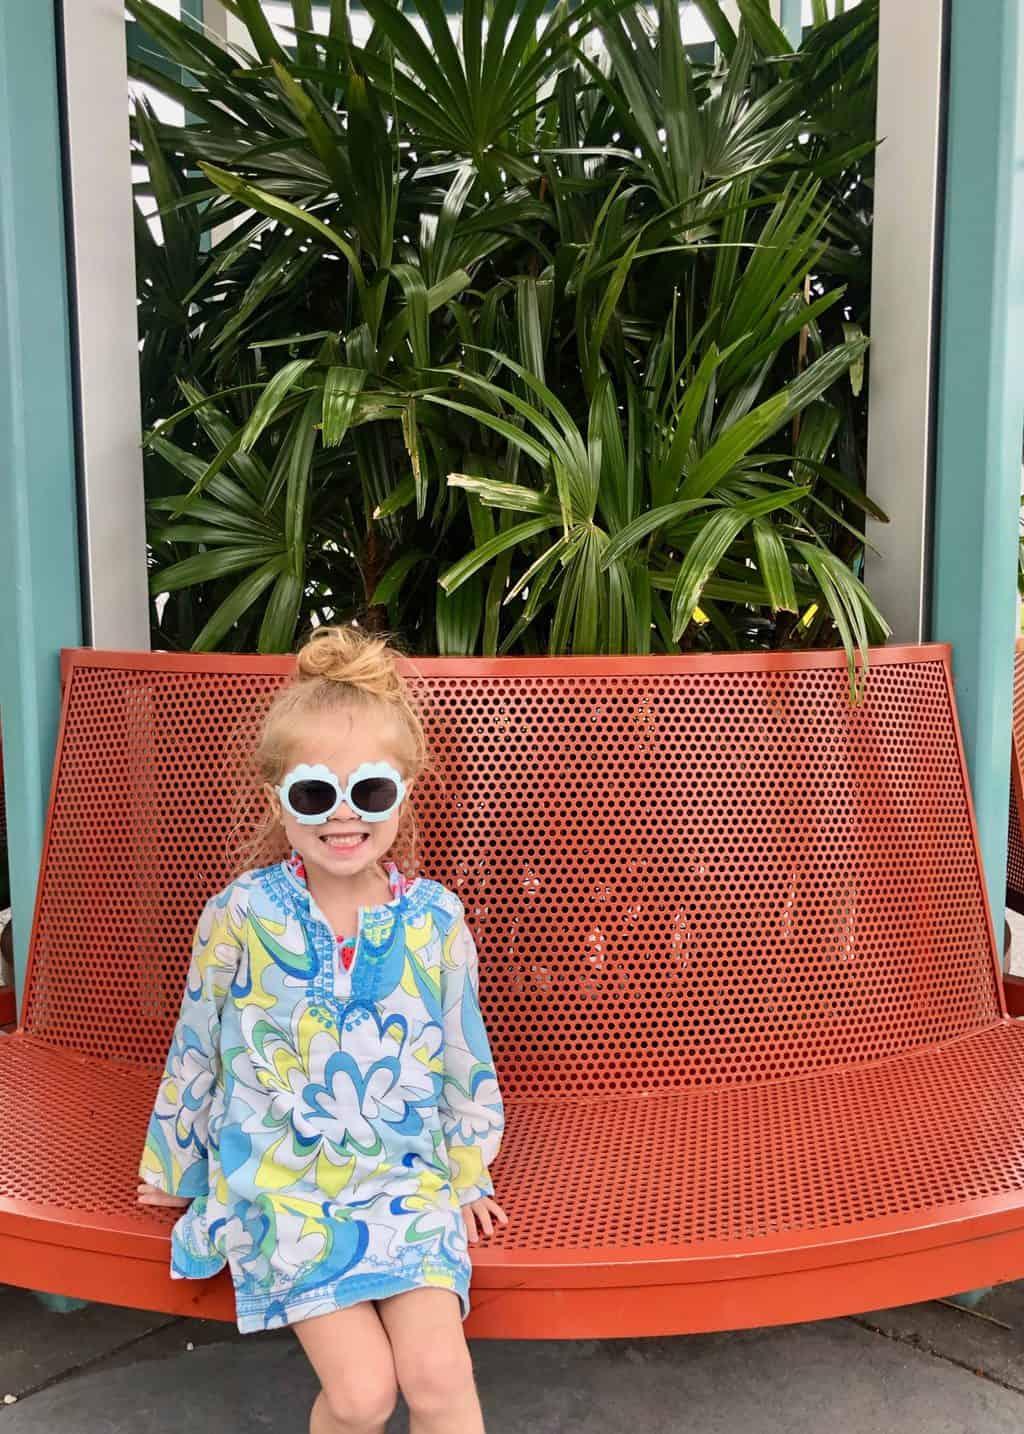 Cabana Bay Beach Resort: Travel Guide for Universal Orlando Resort